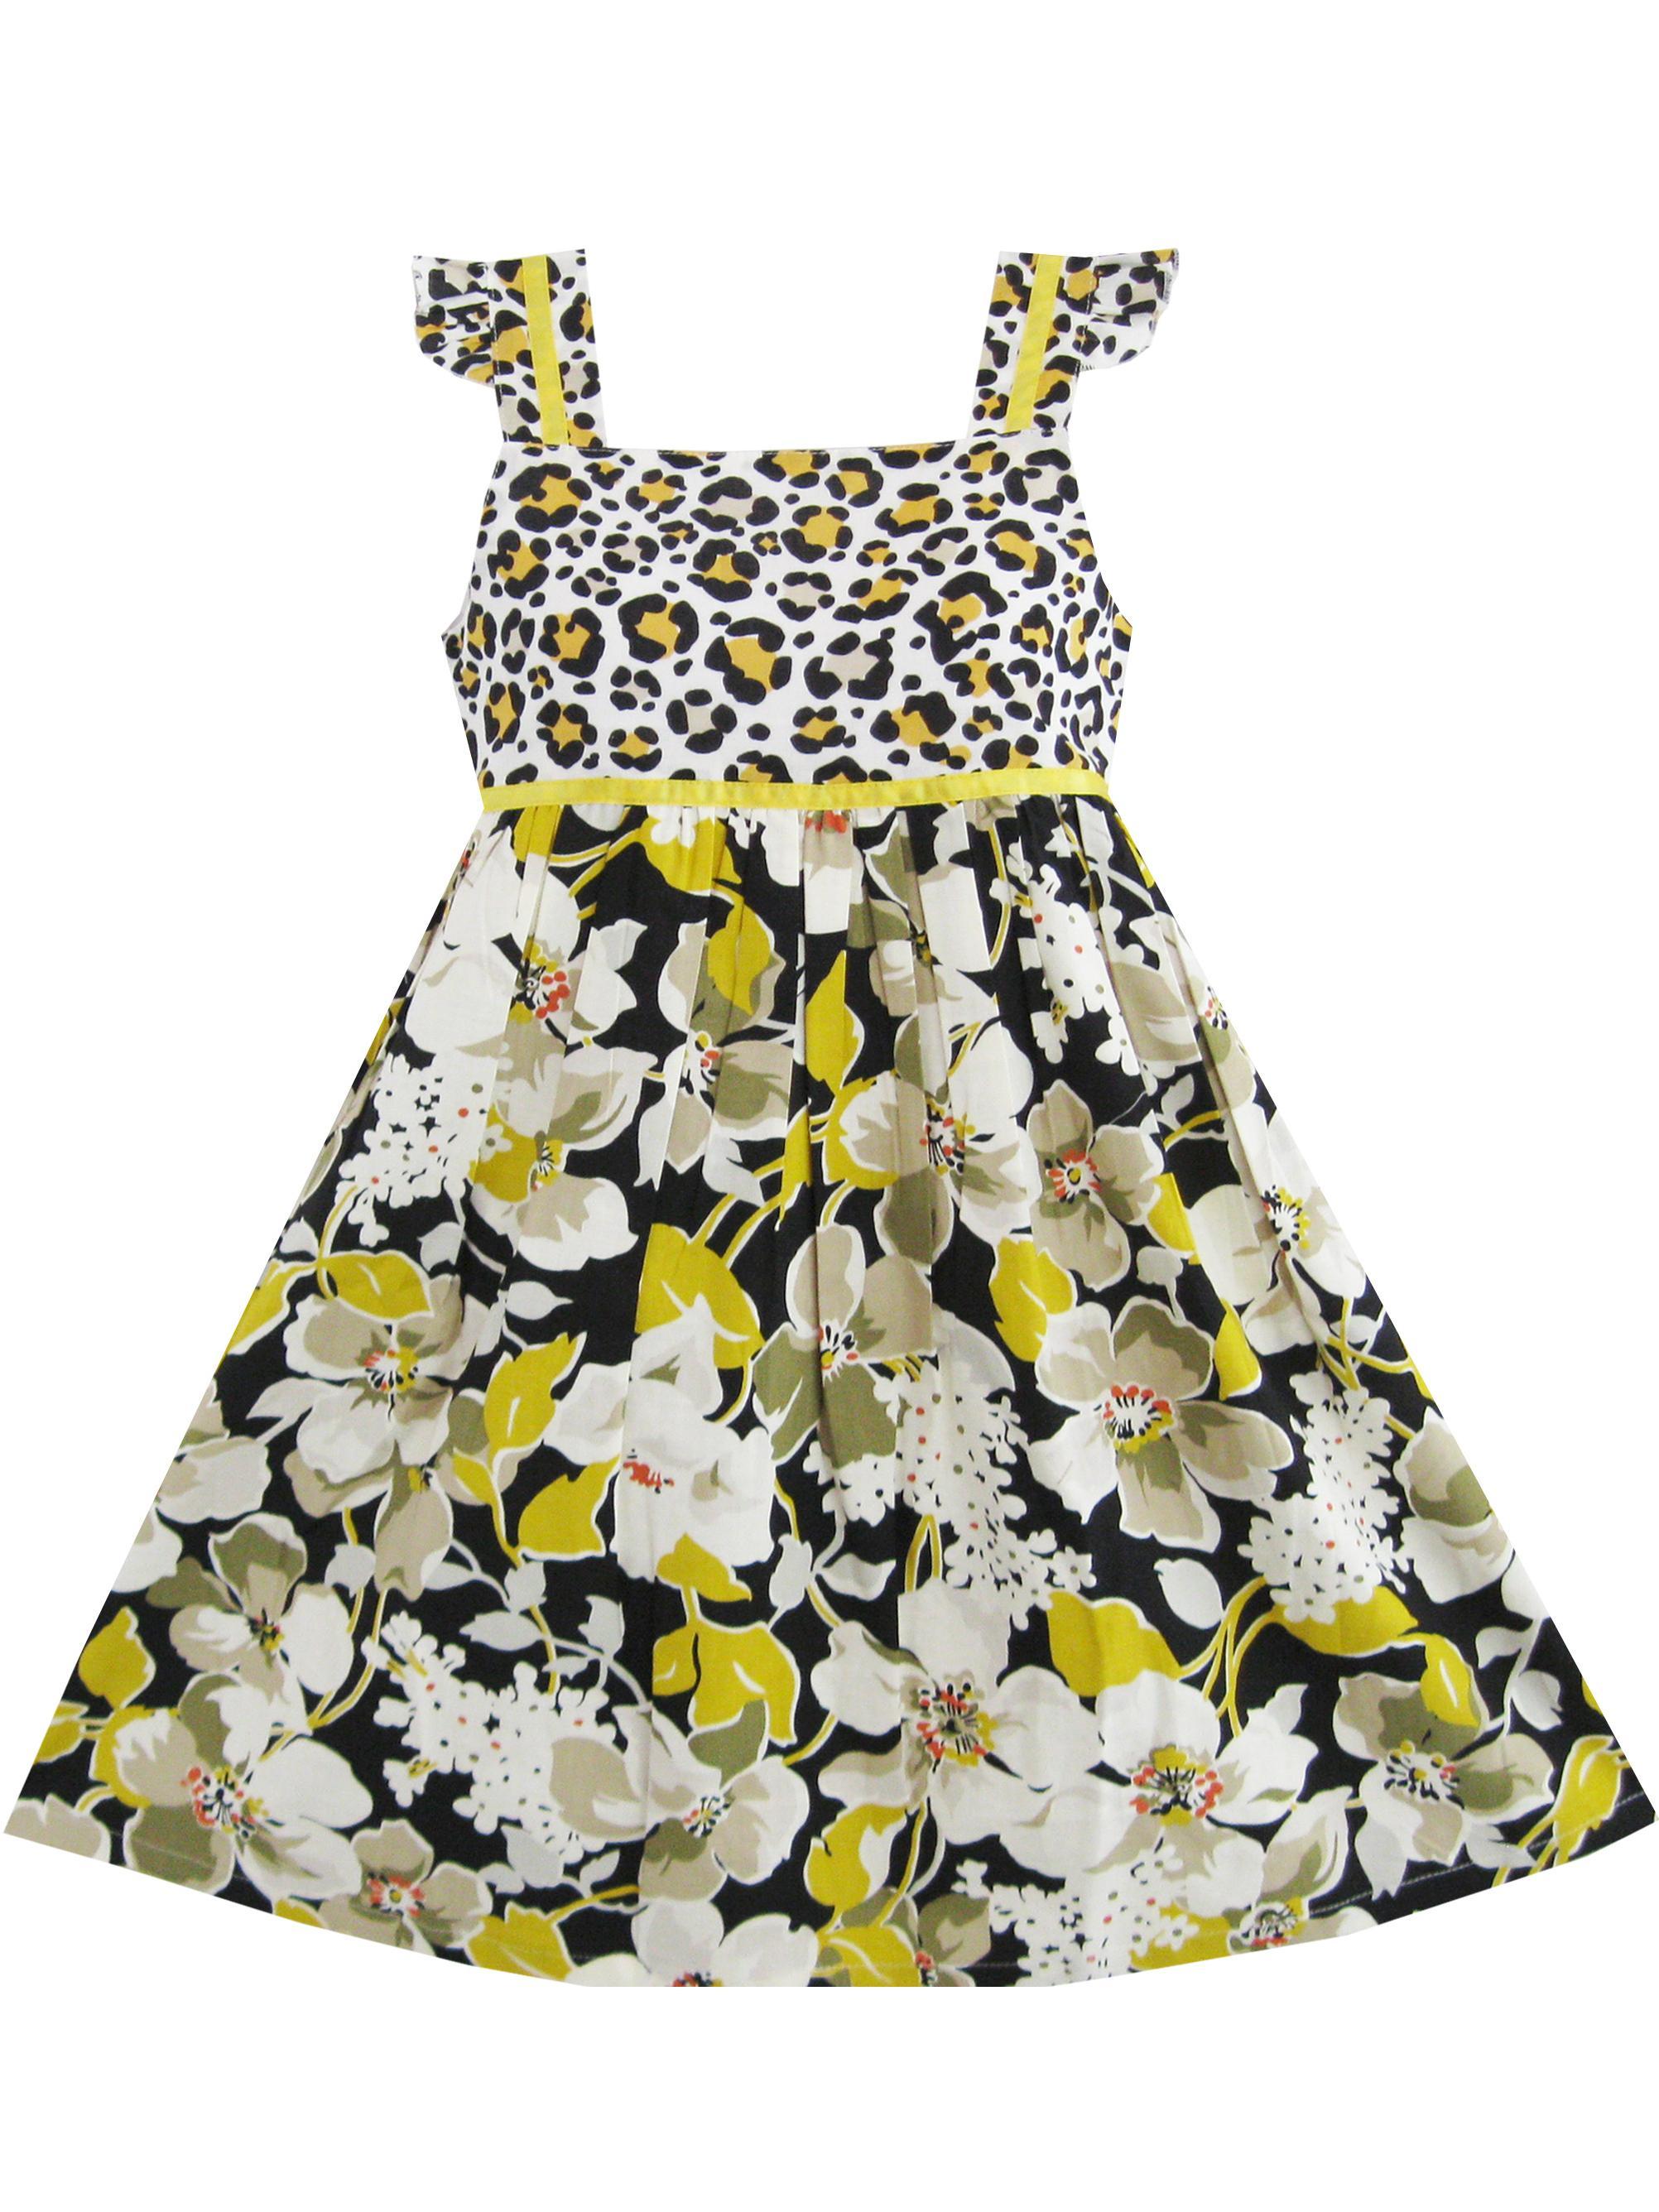 Girls Dress Flower Black Leopard Print Tank School Uniform Kids 3